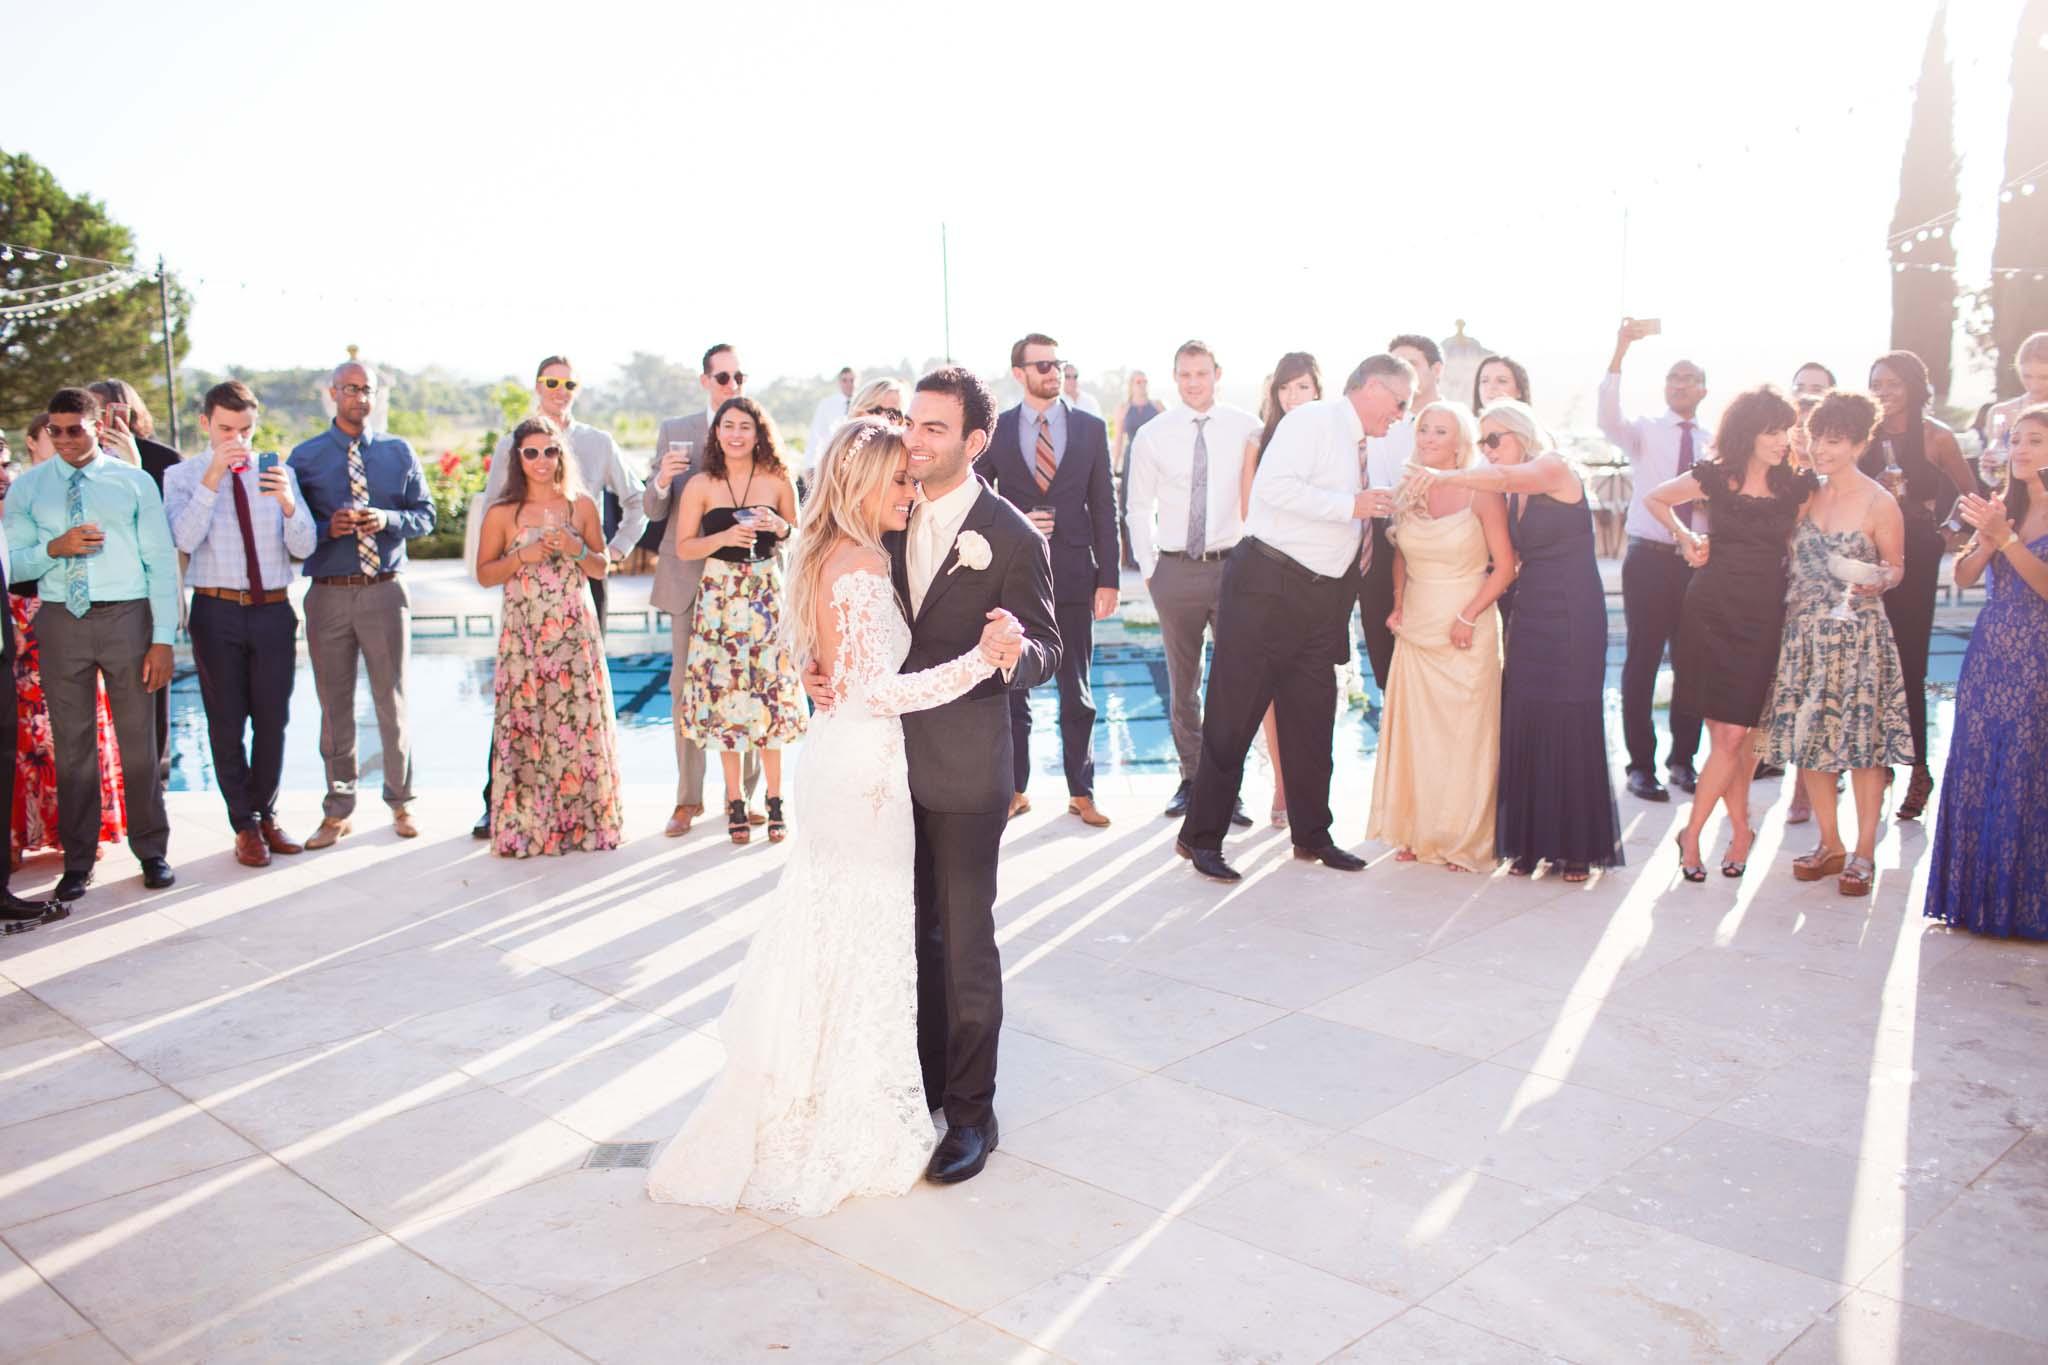 rancho_santa_fe_estate_wedding_116.jpg